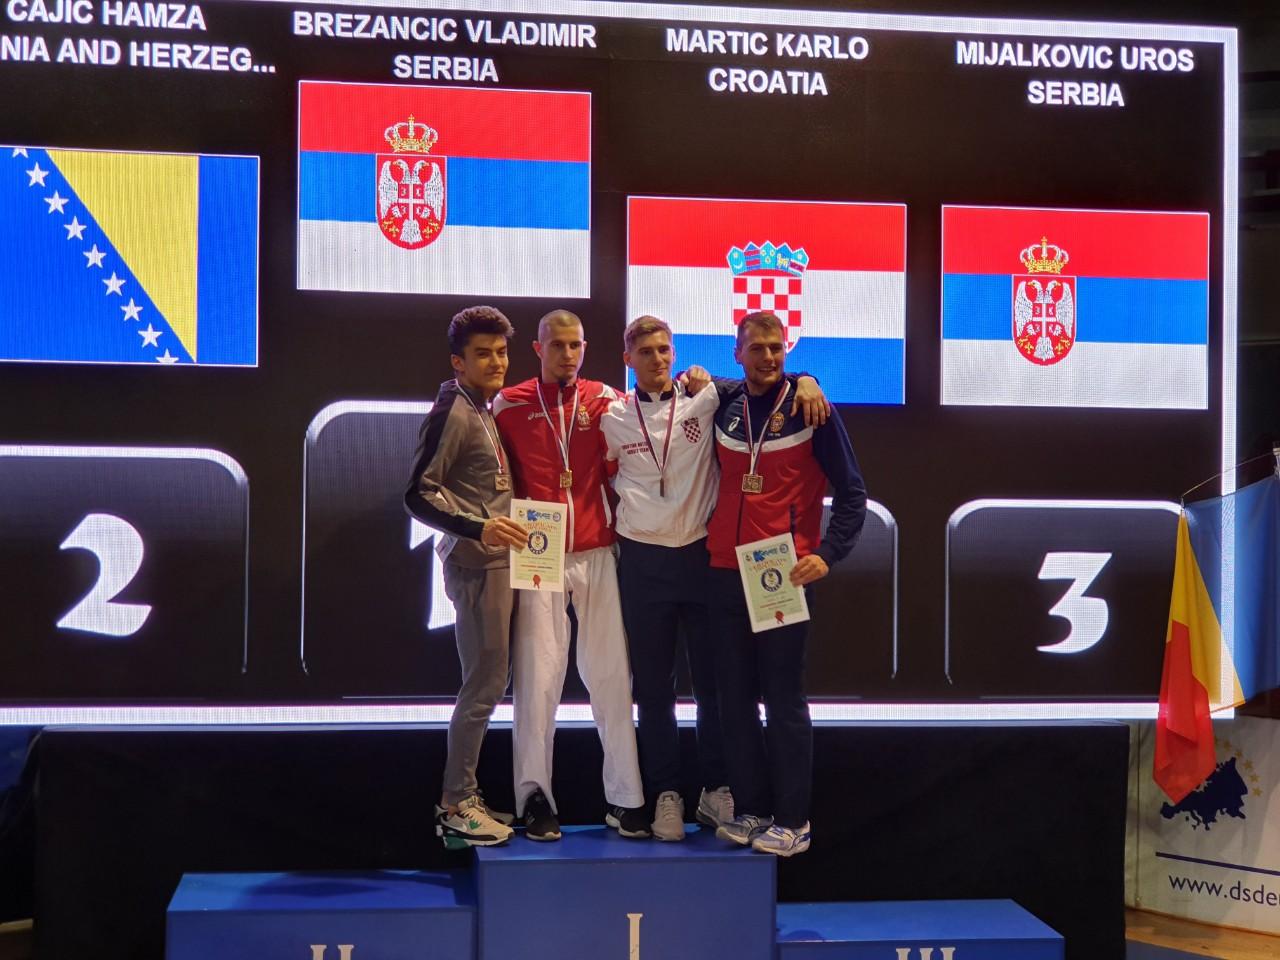 Photo of Urošu bronza na Balkanskom prvenstvu u Čačku